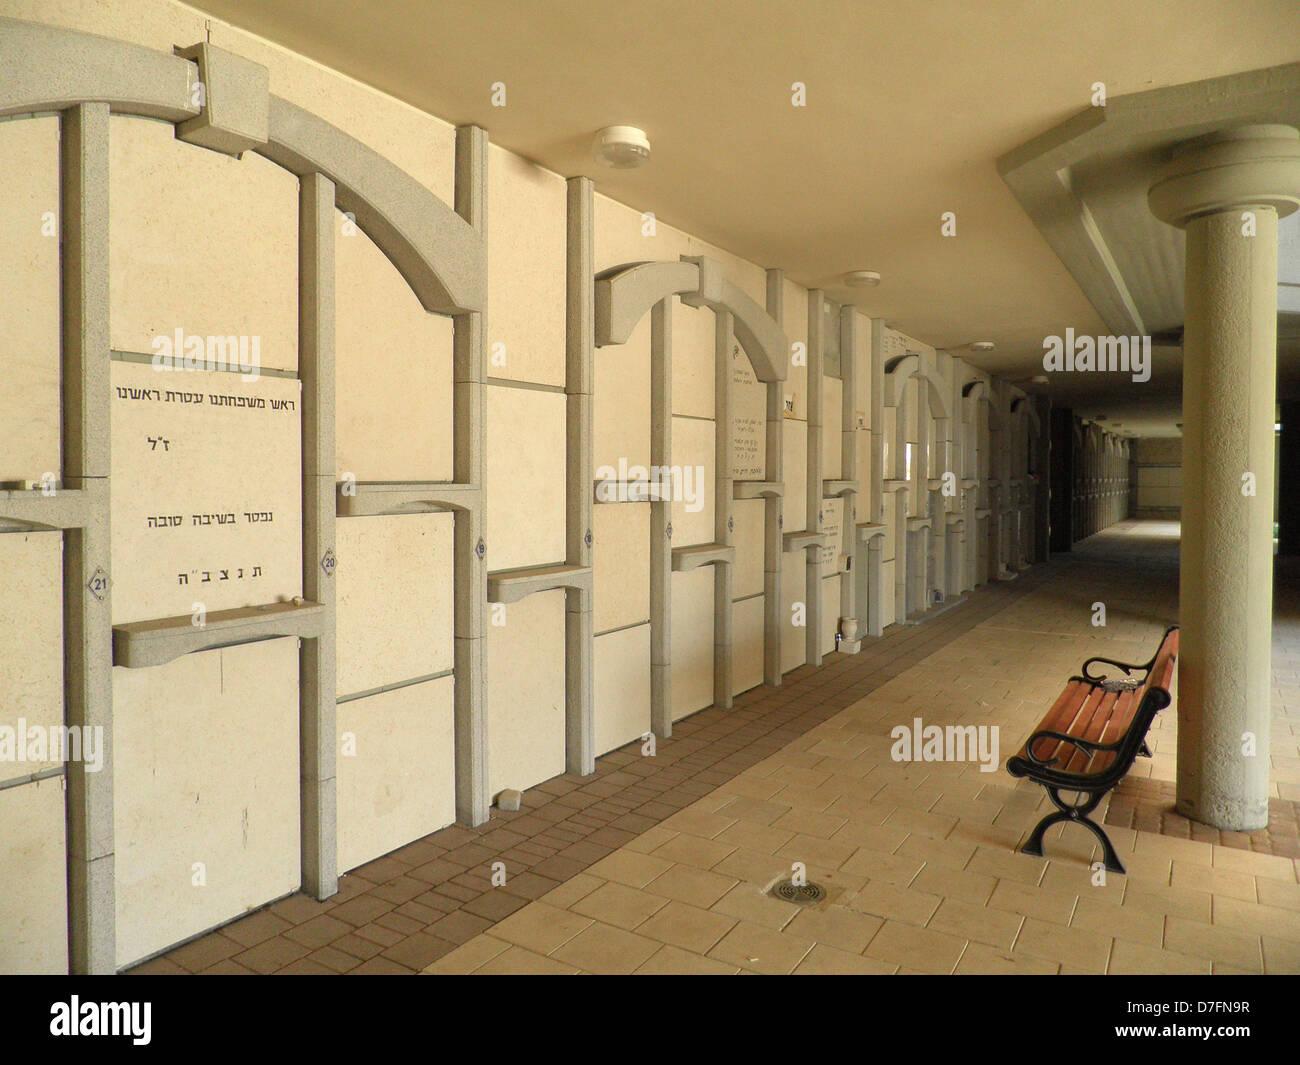 Burial chambers at Kiryat Shaul multi floors tower cemetery in Tel Aviv - Stock Image